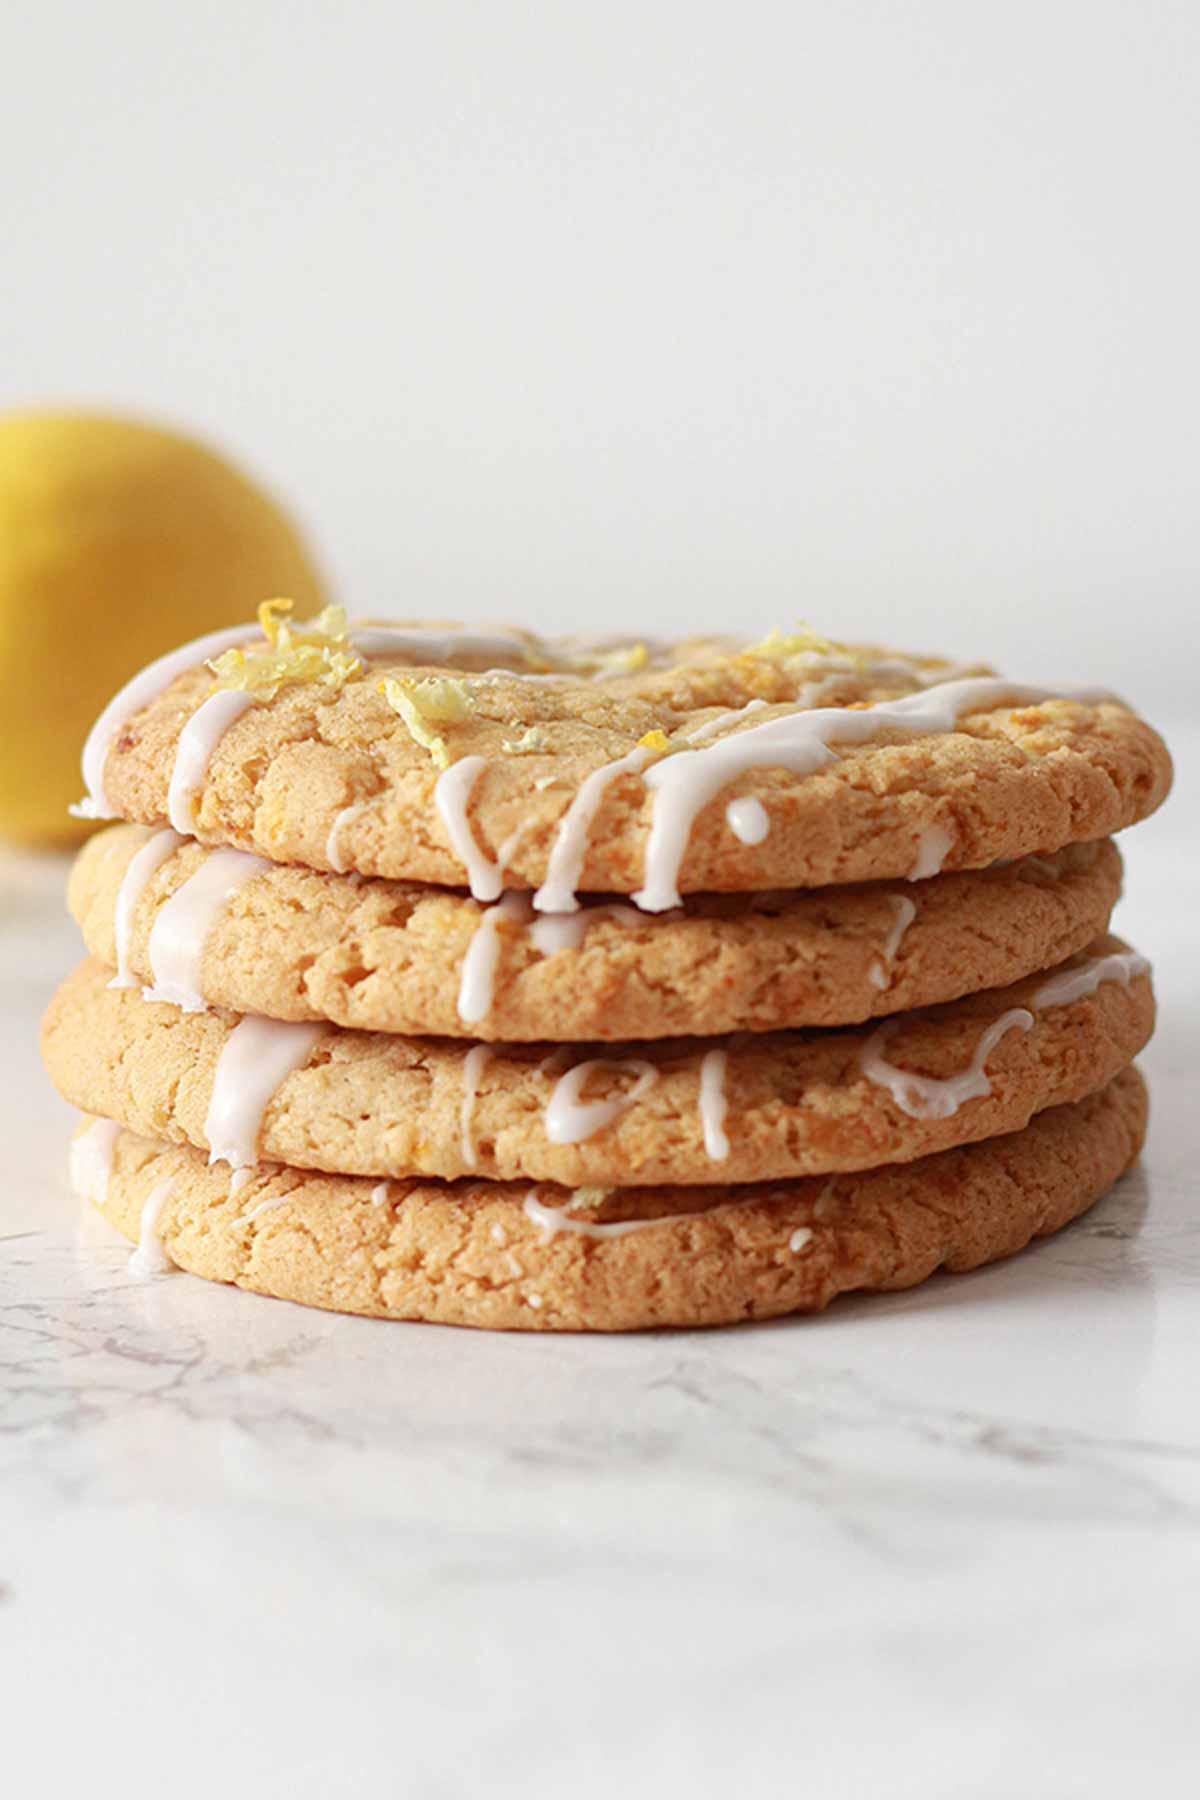 Stack Of 4 Lemon Drizzle Cookies